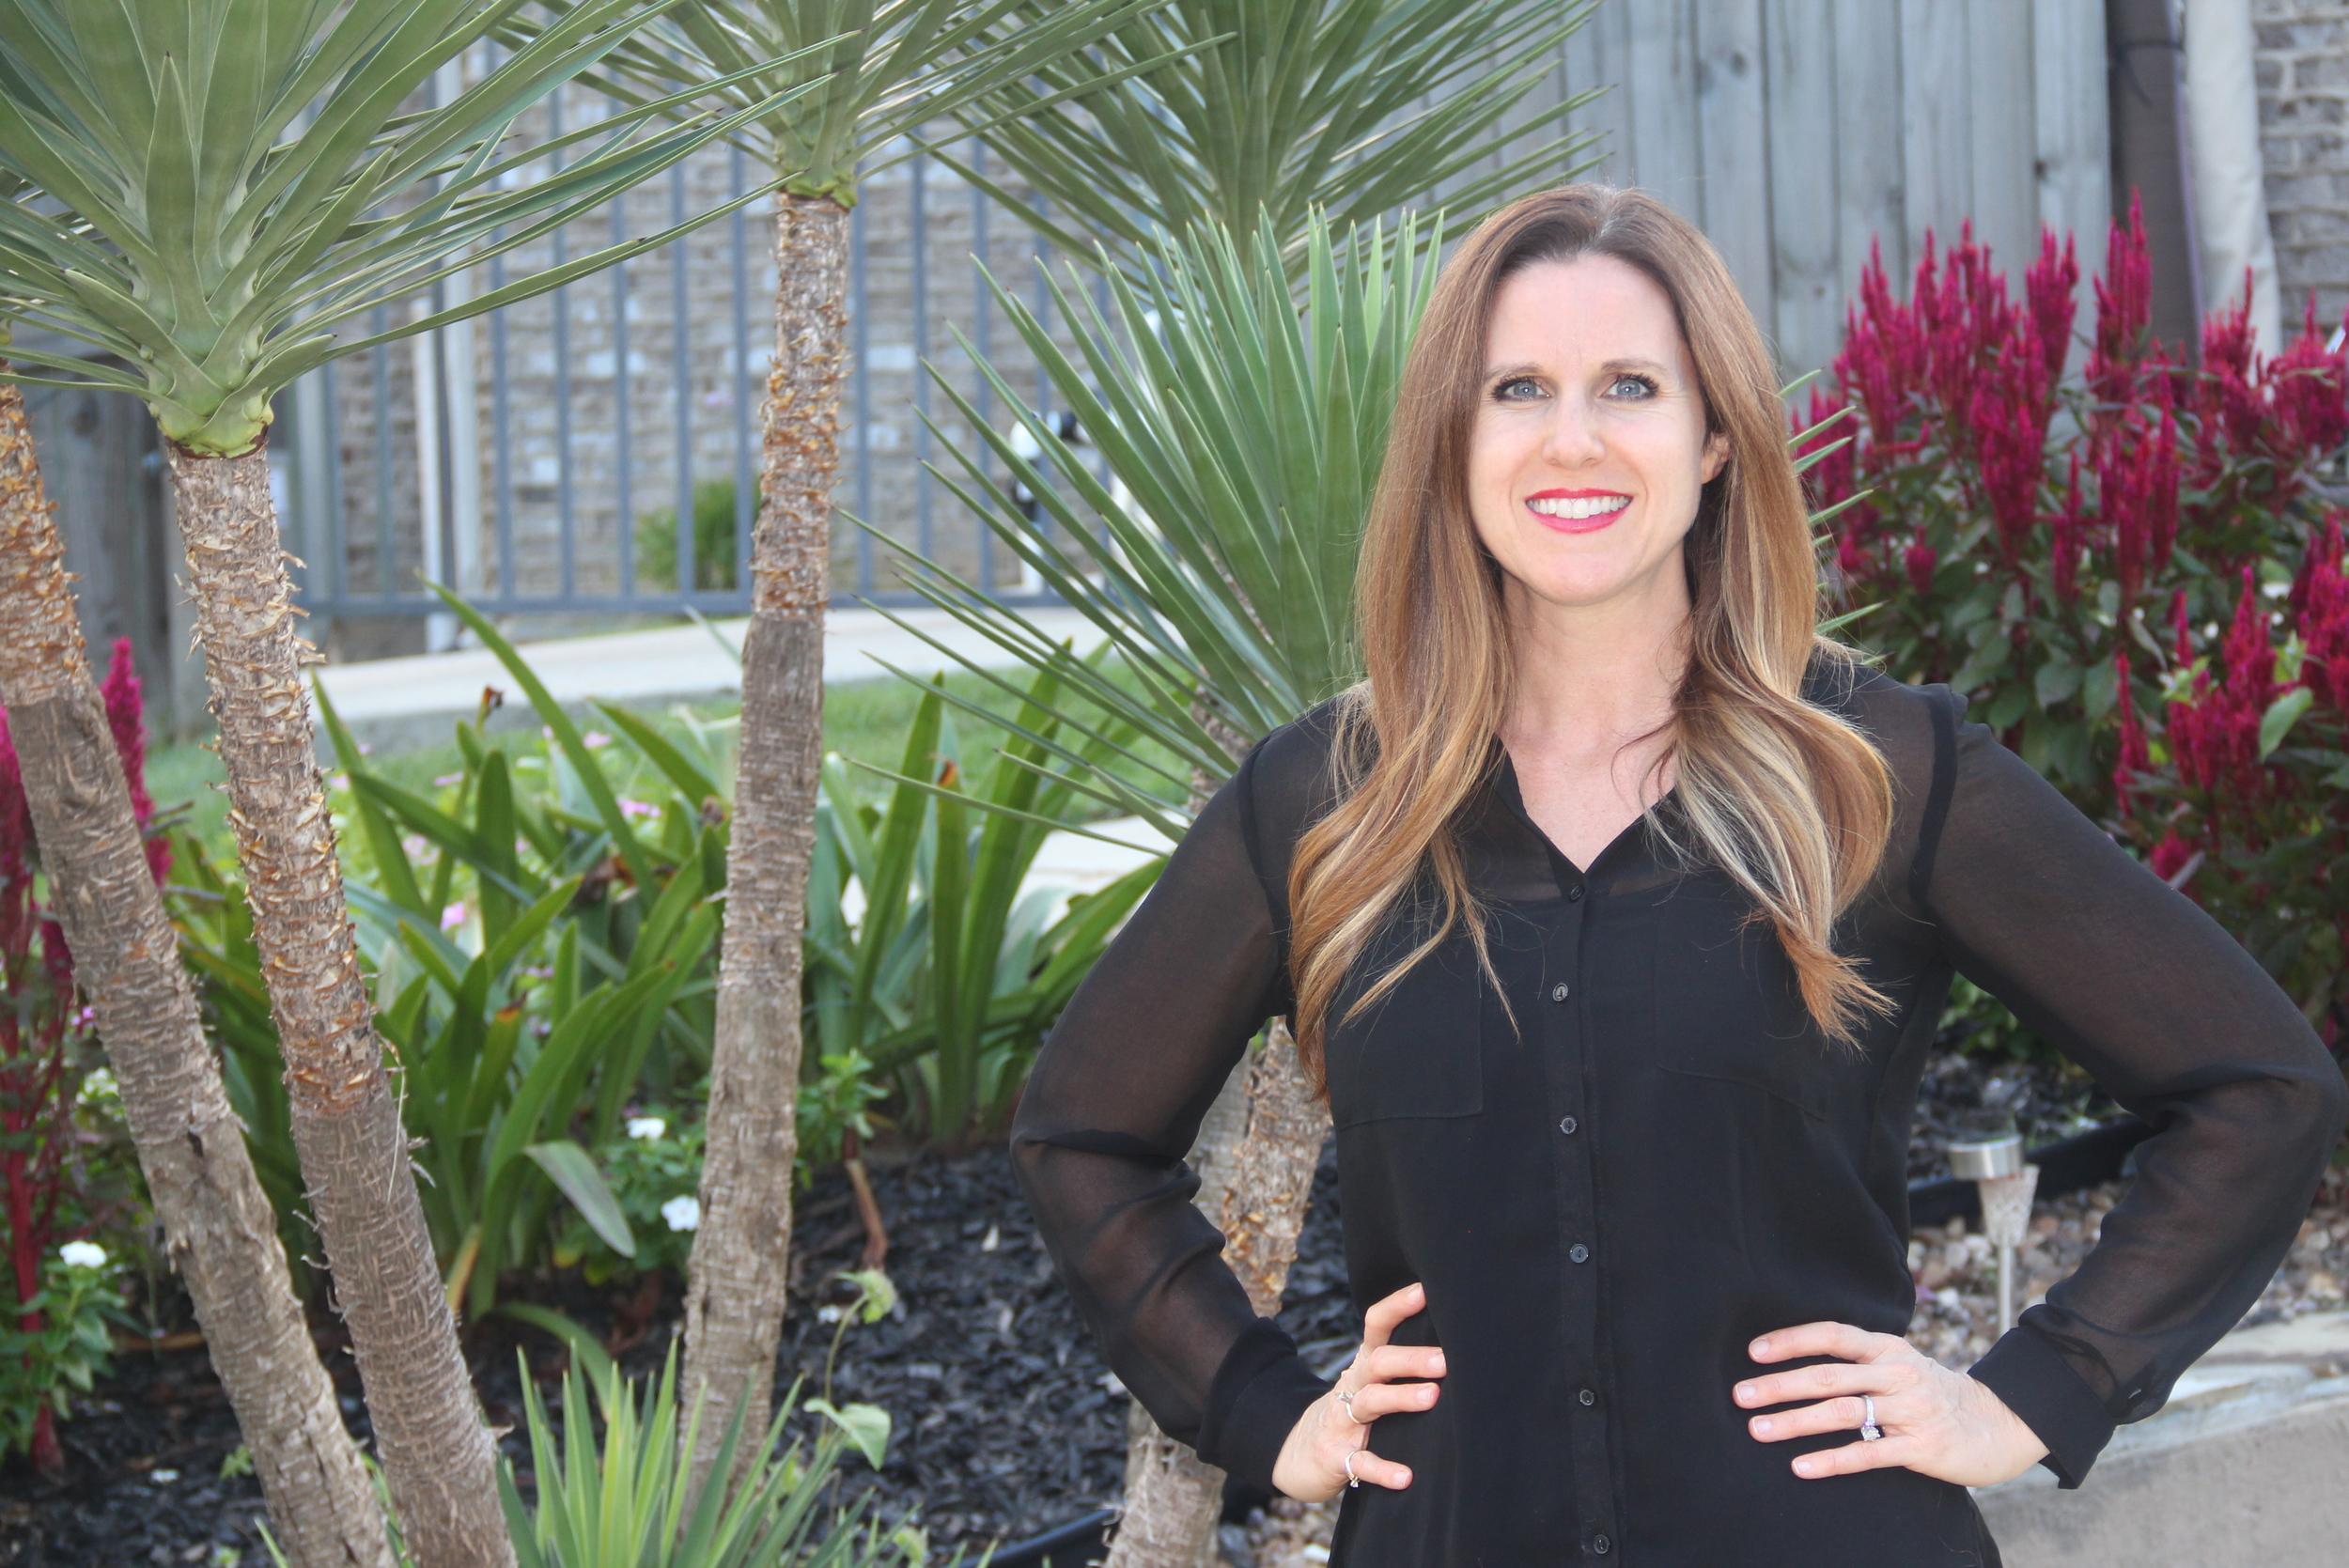 Julie Bridges, Dance Studio Owner